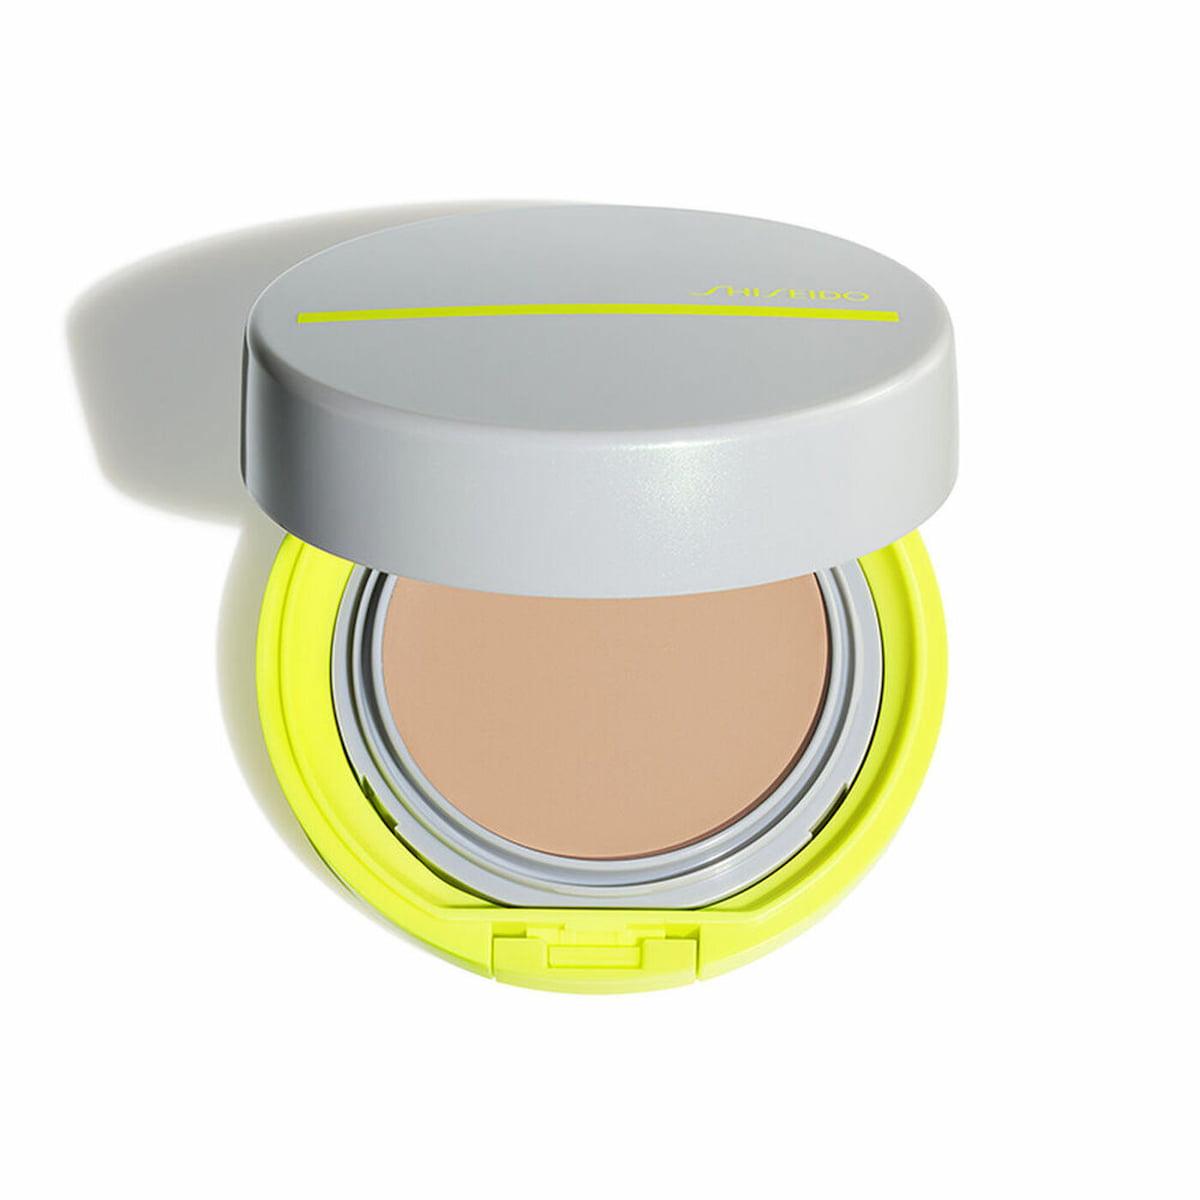 Shiseido - Sports BB Compact SPF 50